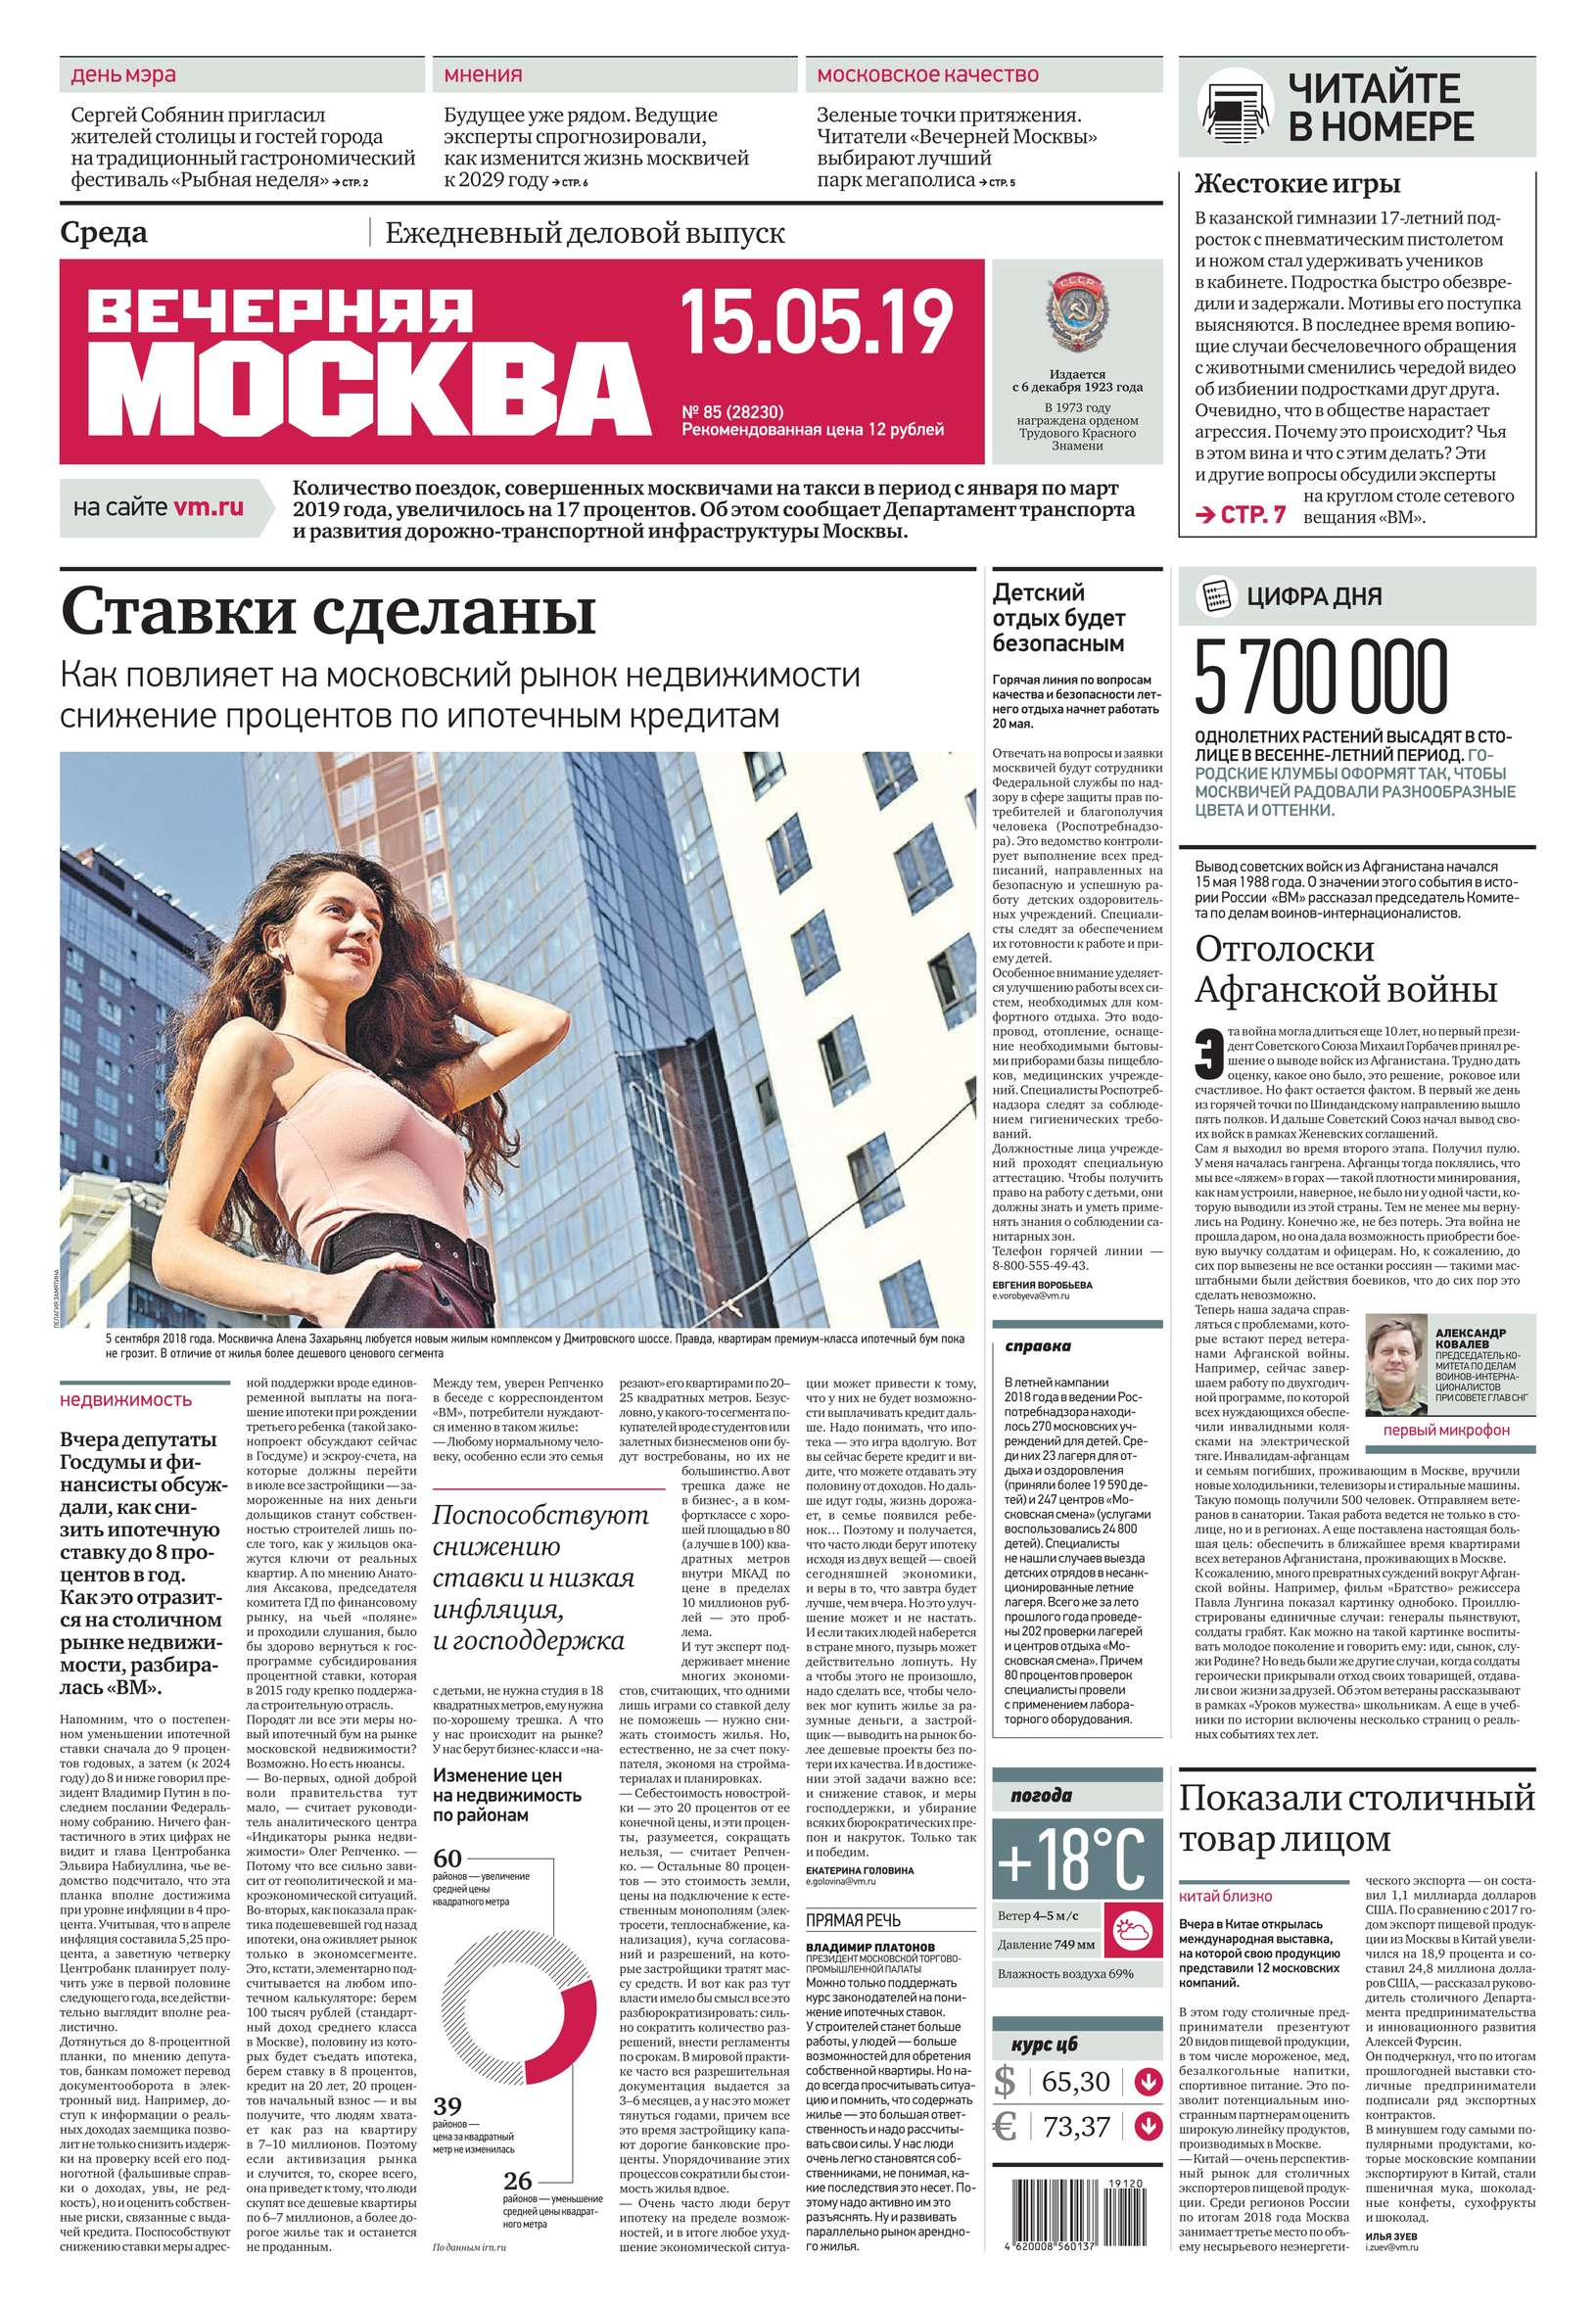 Редакция газеты Вечерняя Москва Вечерняя Москва 85-2019 вечерняя москва 2019 08 06t20 30